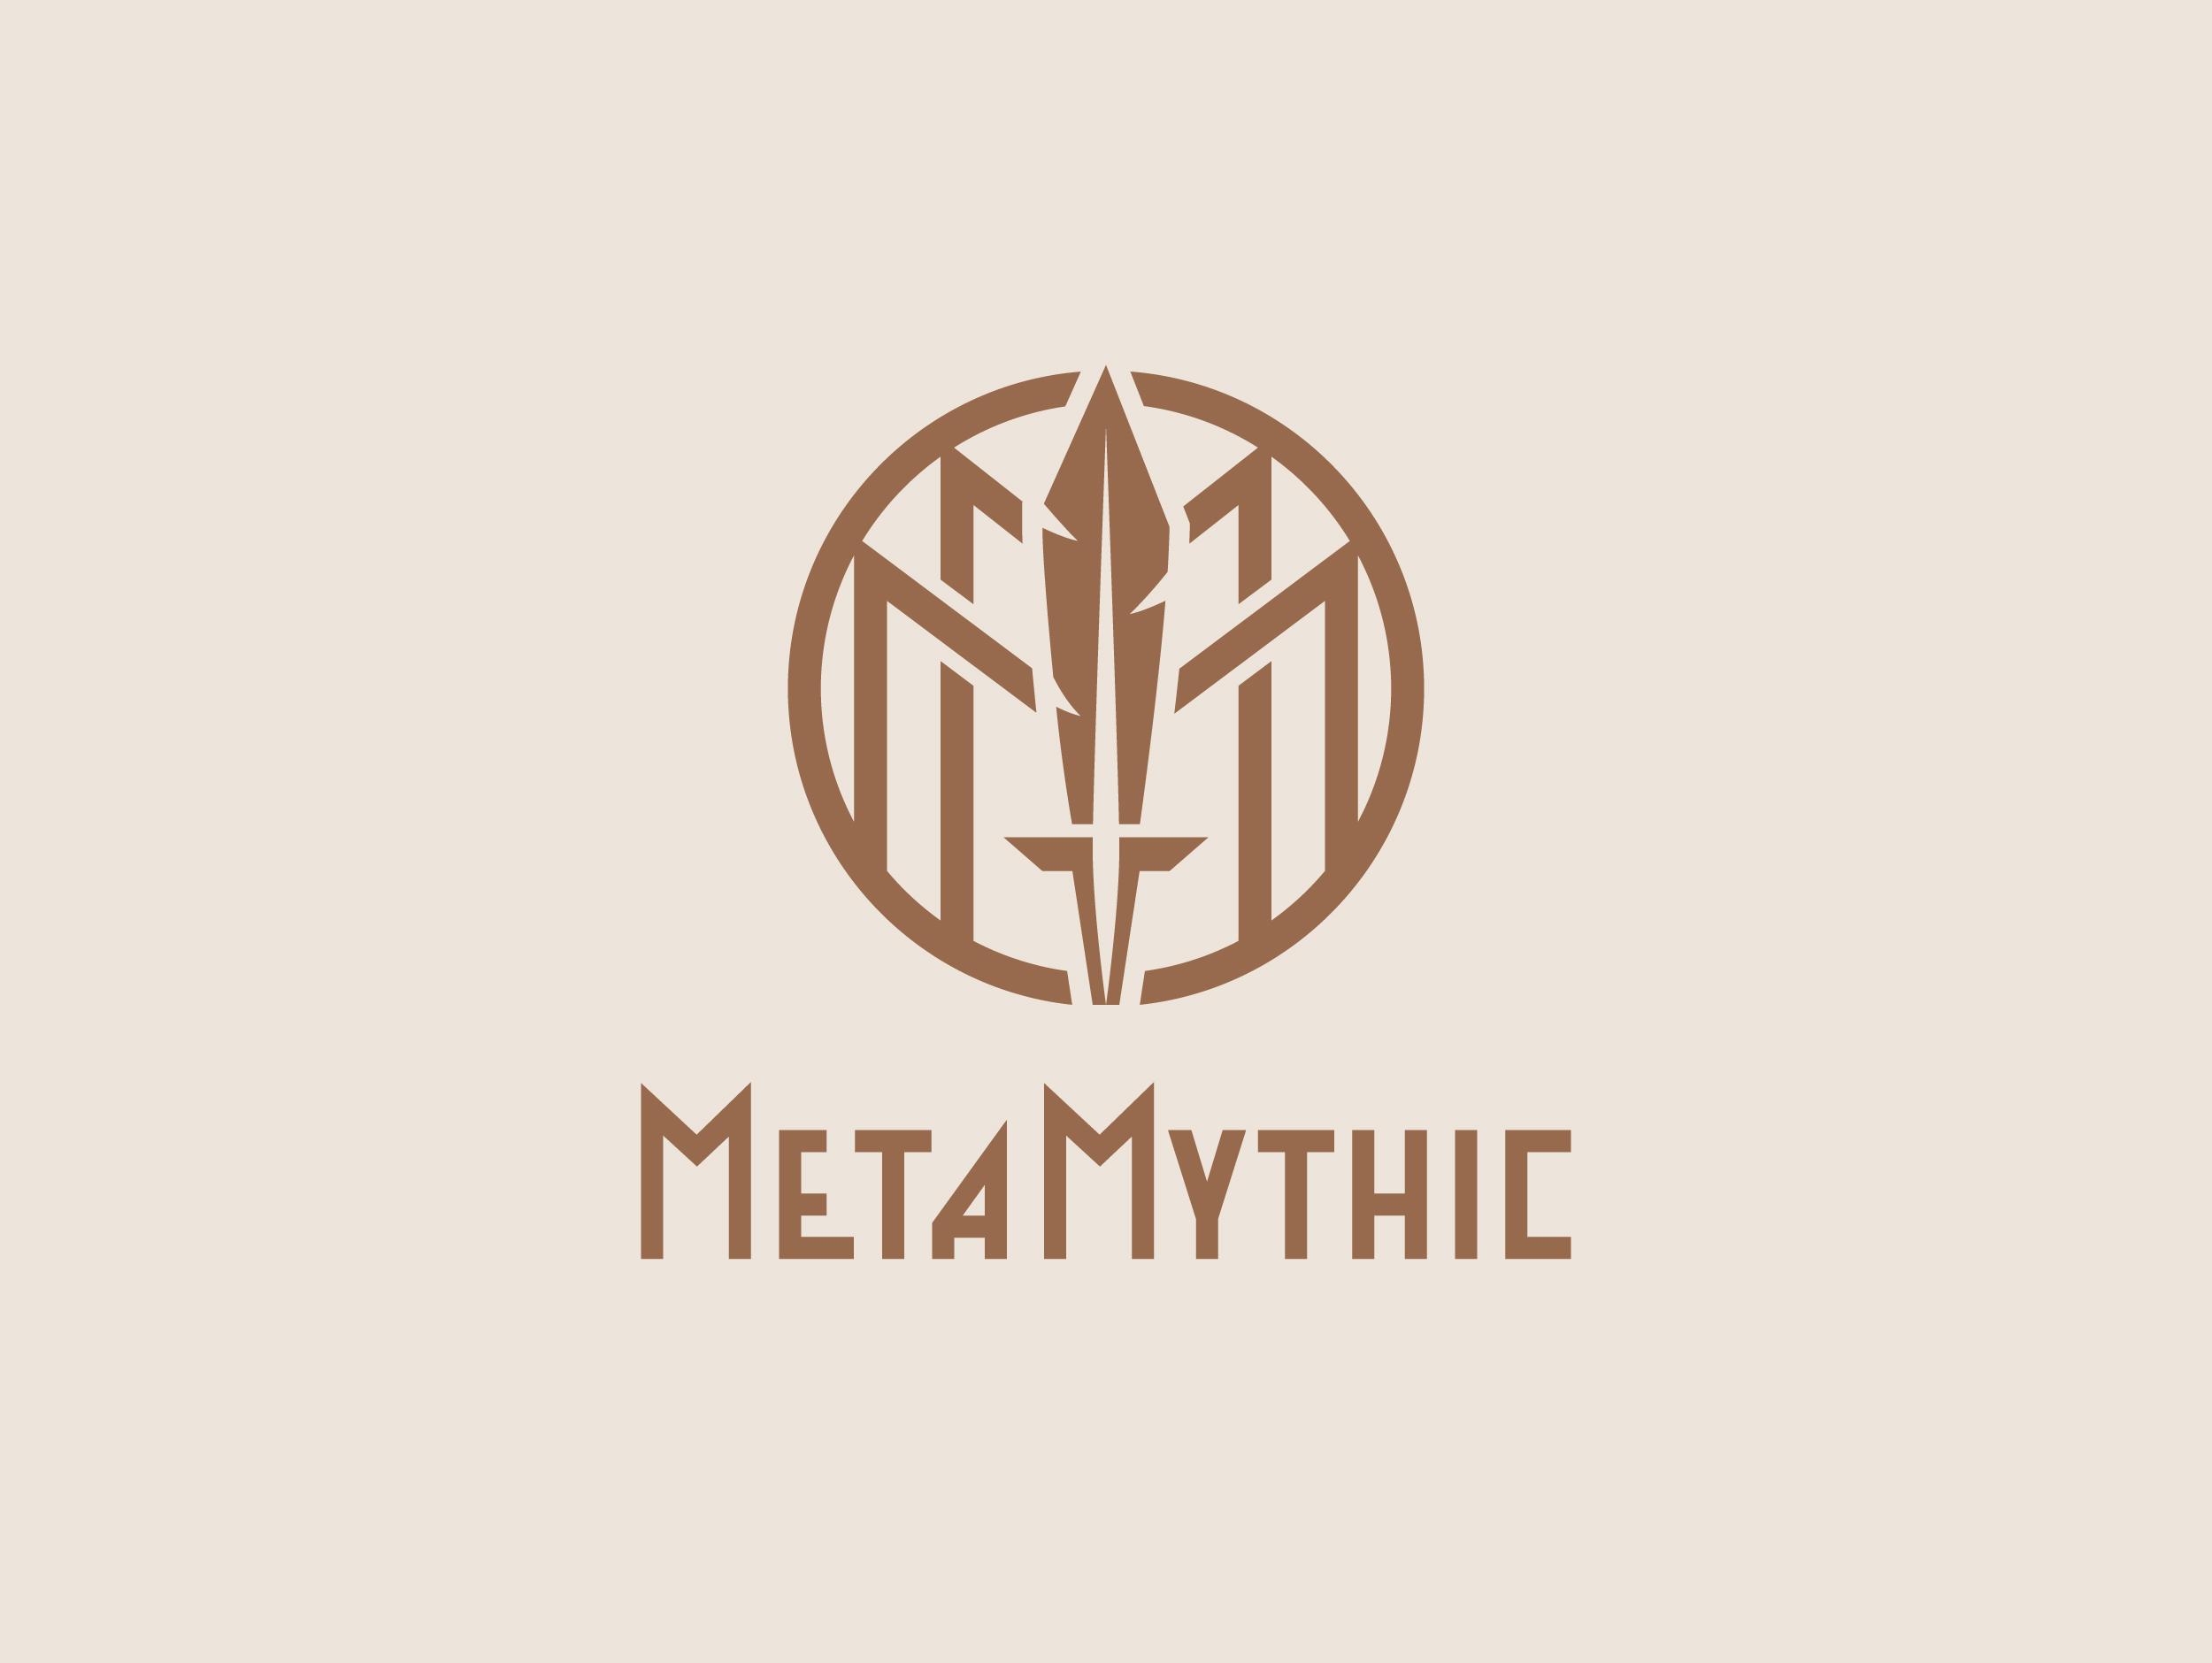 MetaMythic Logo